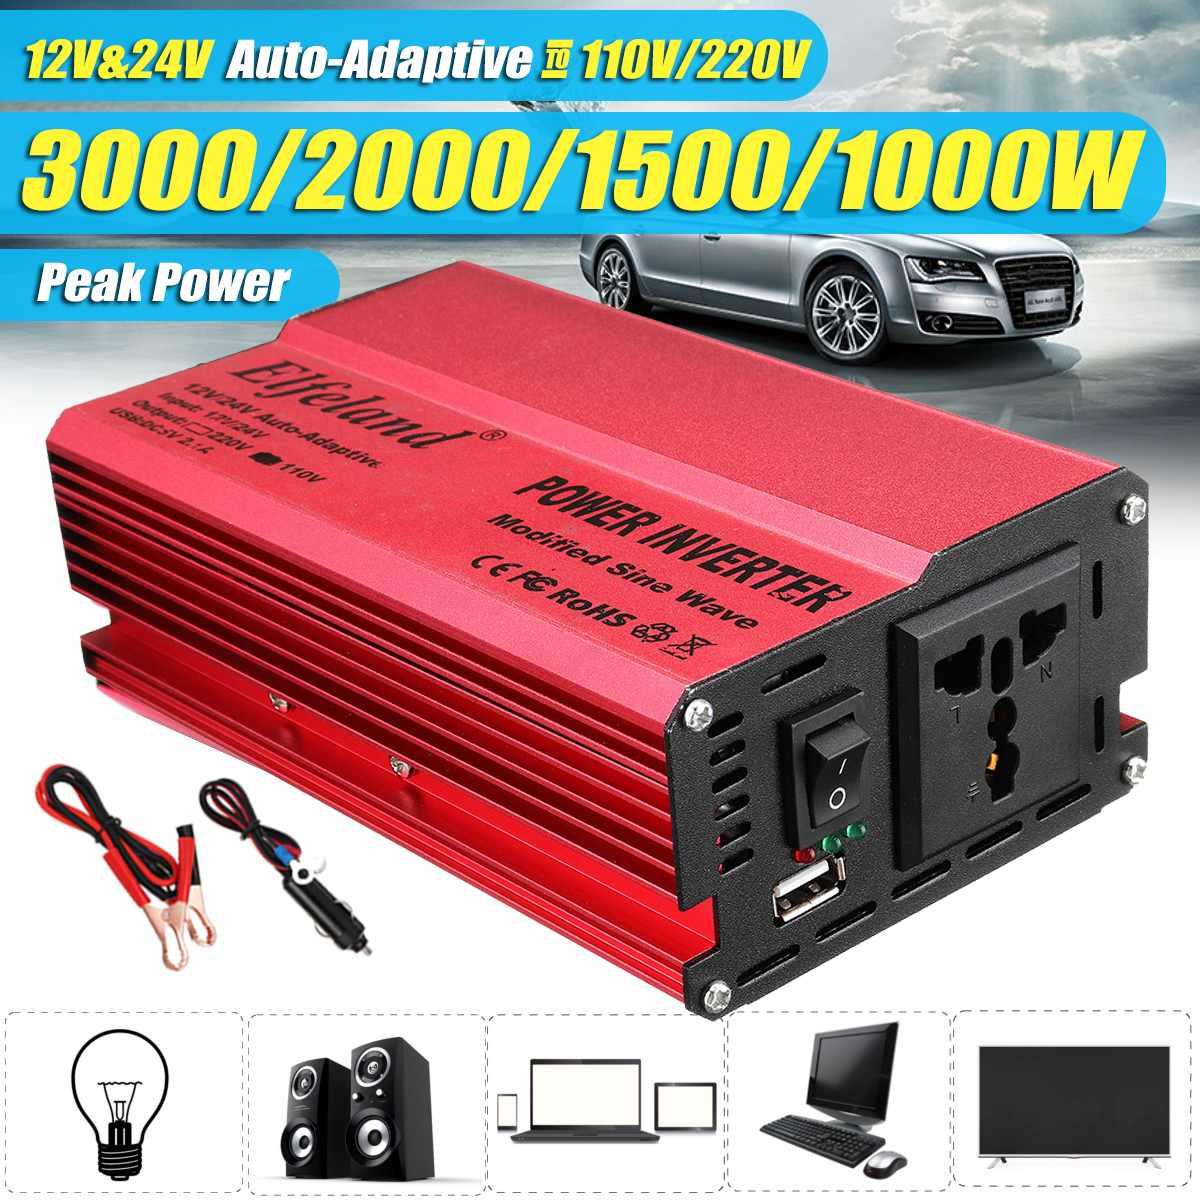 Electric Vehicle Parts 1000w Red Vehicle Dc12v-ac220v Led Power Inverter Converter 4usb Ports Universal Controlador